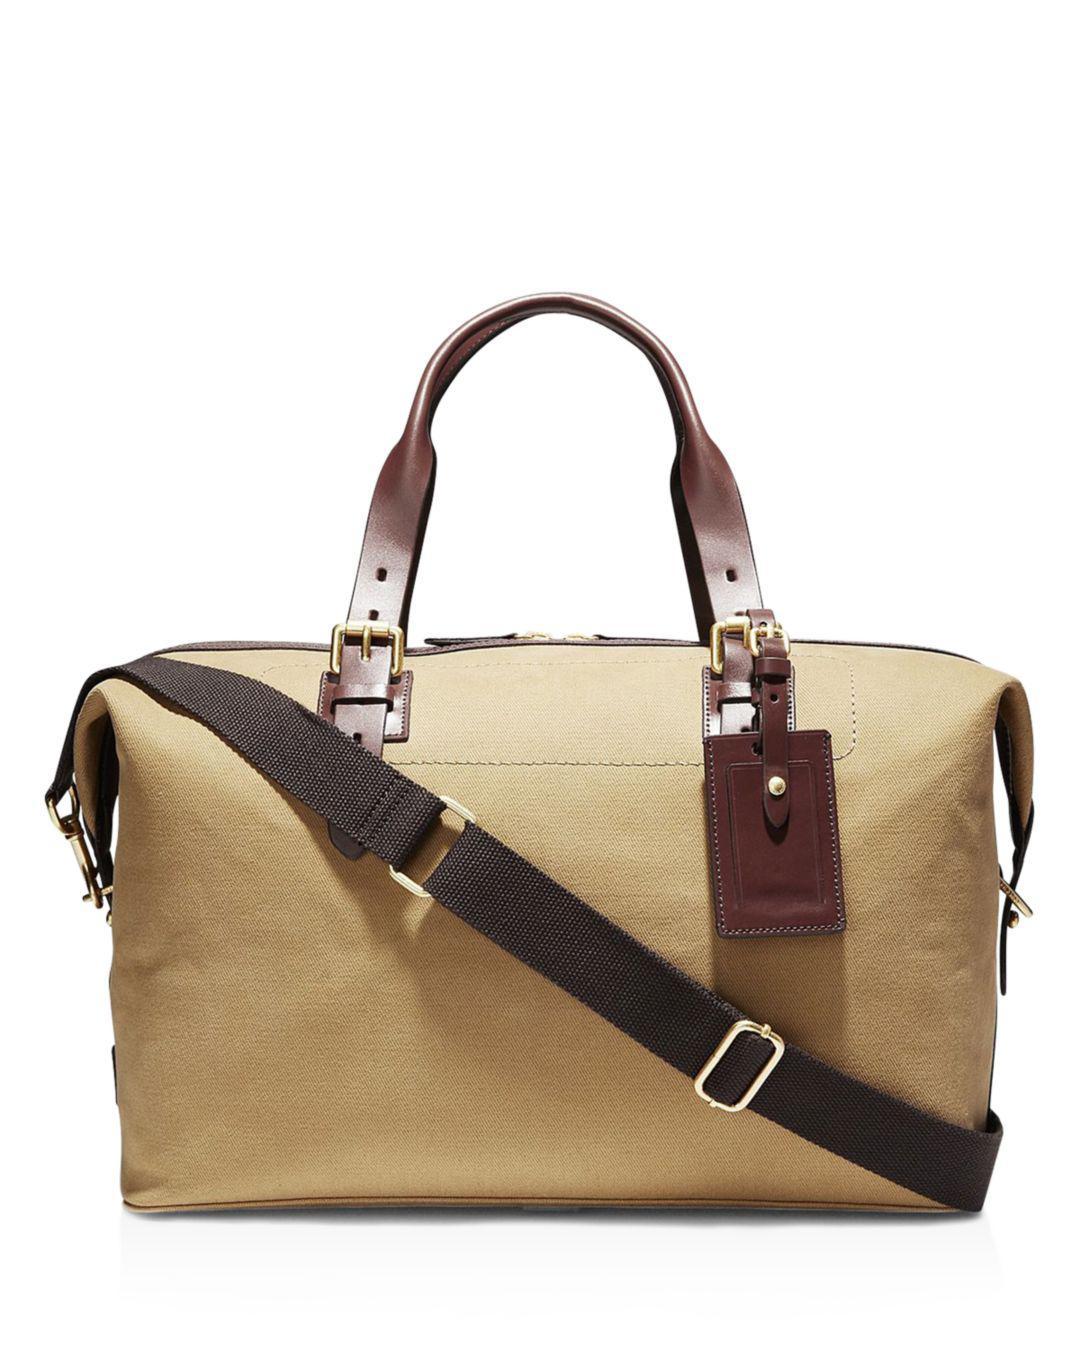 Lyst - Cole Haan Twill Brayton Duffel Bag in Brown for Men 03a0dc1009ec1